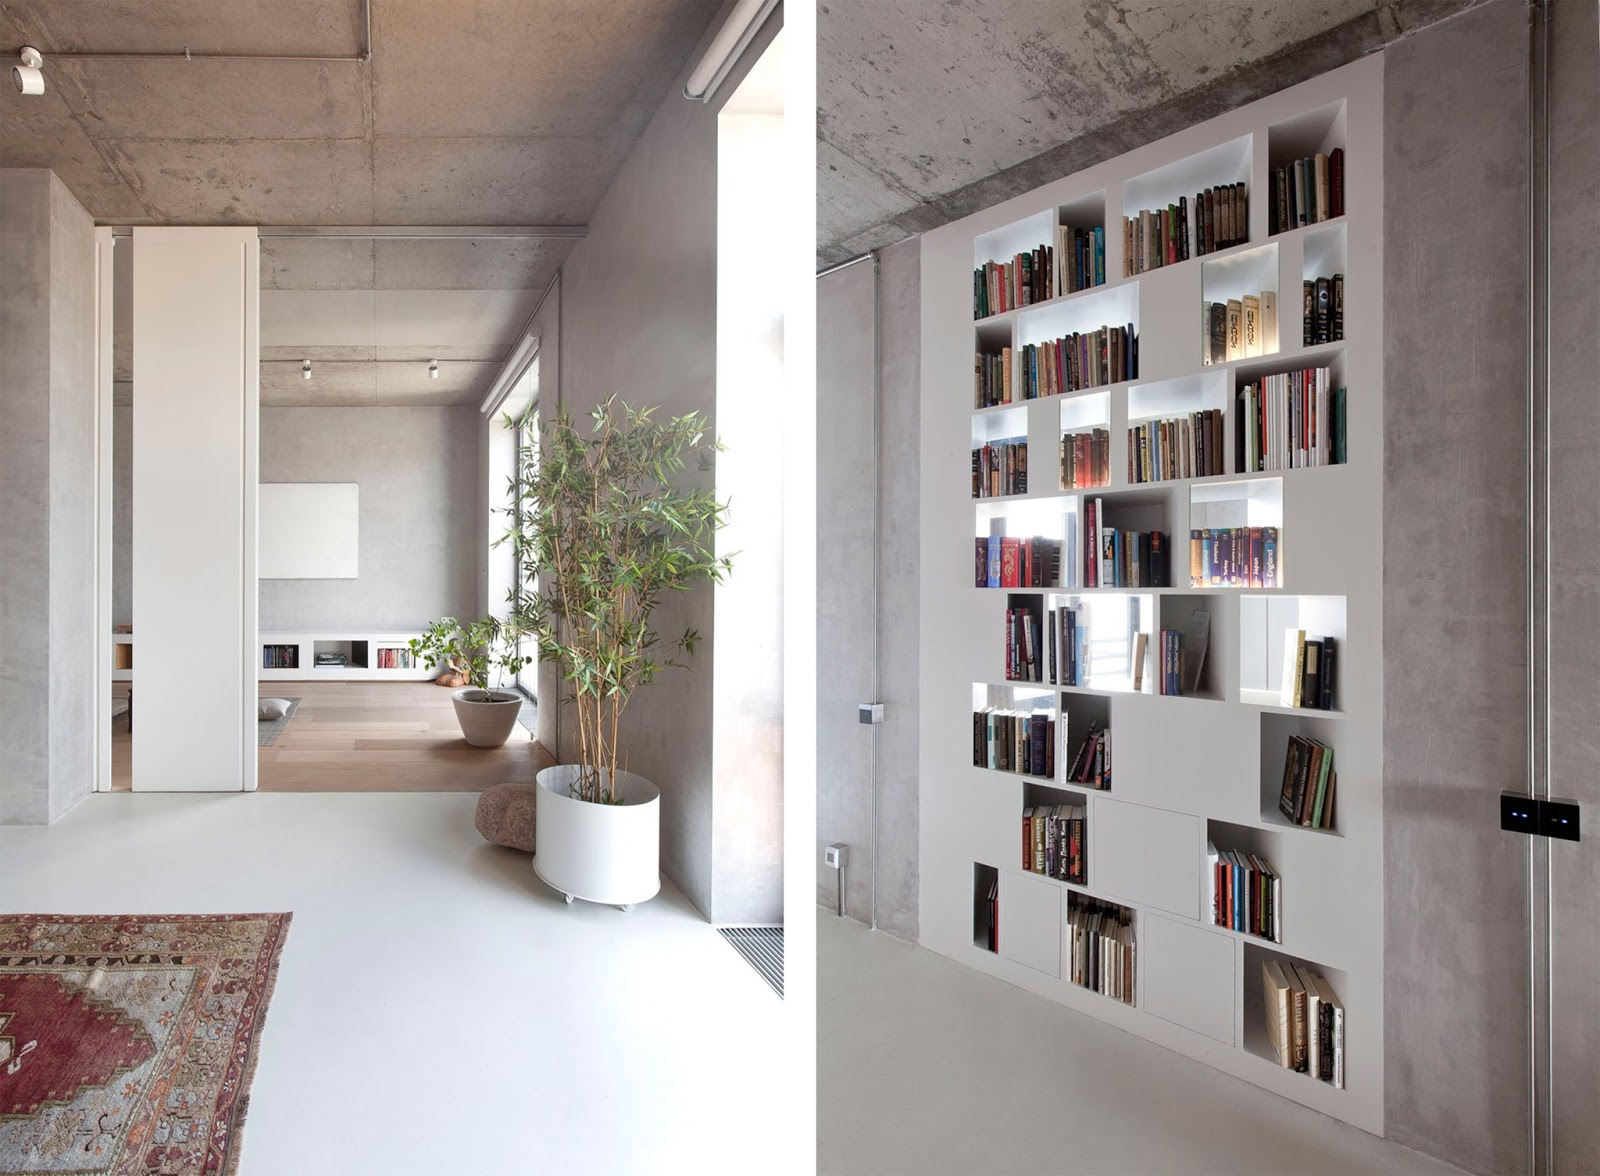 Appartamento a mosca in stile giapponese by m17 studio for Pareti divisorie stile giapponese